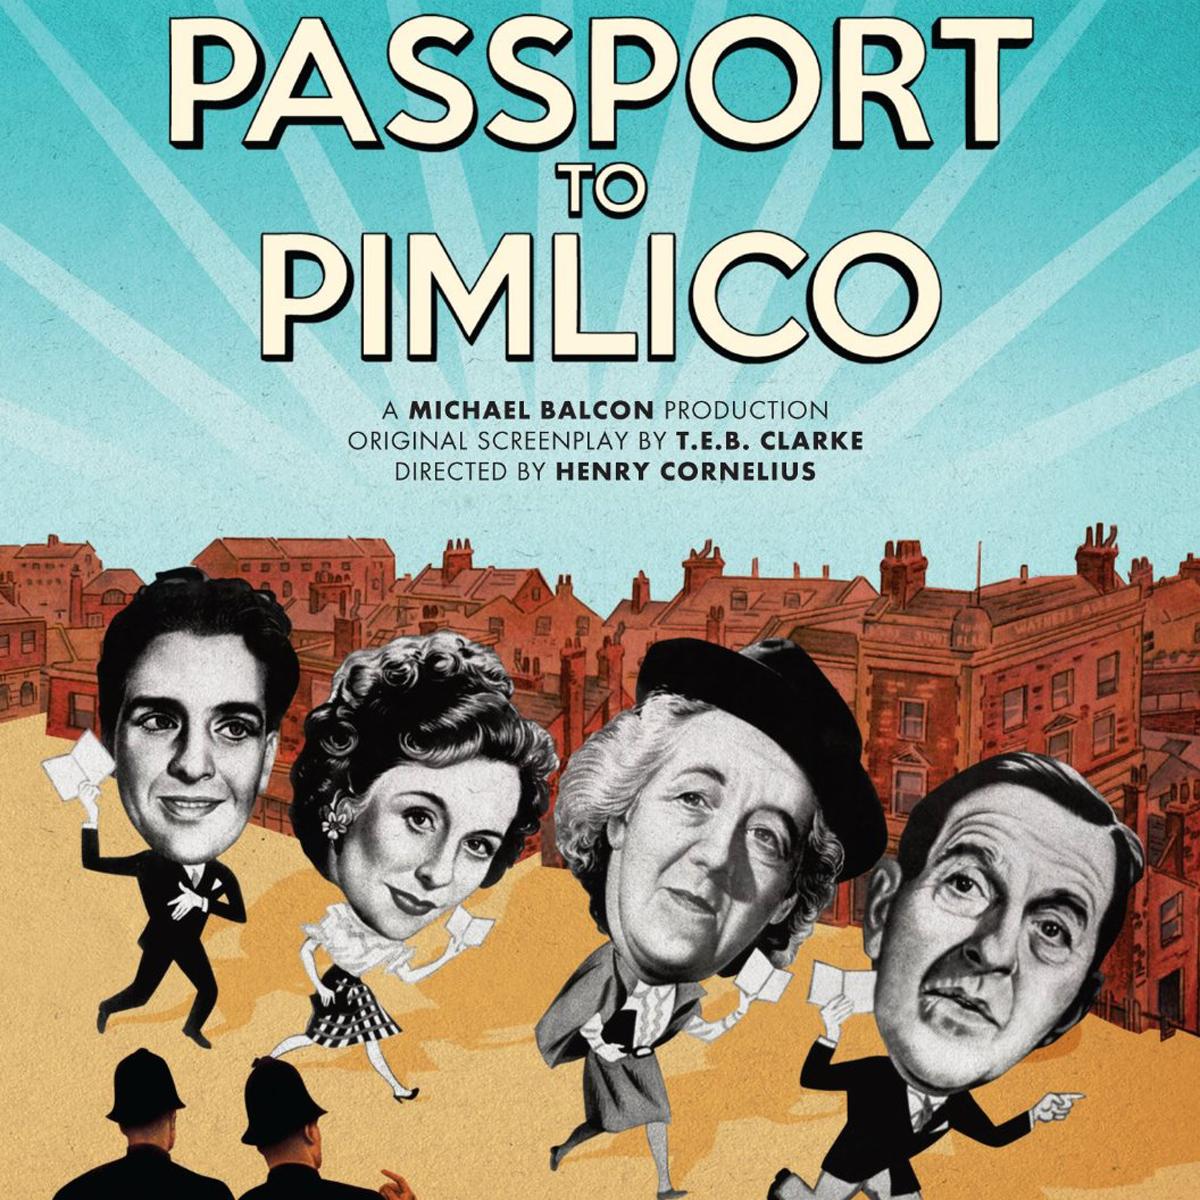 ISTYA Passport to Pimlico